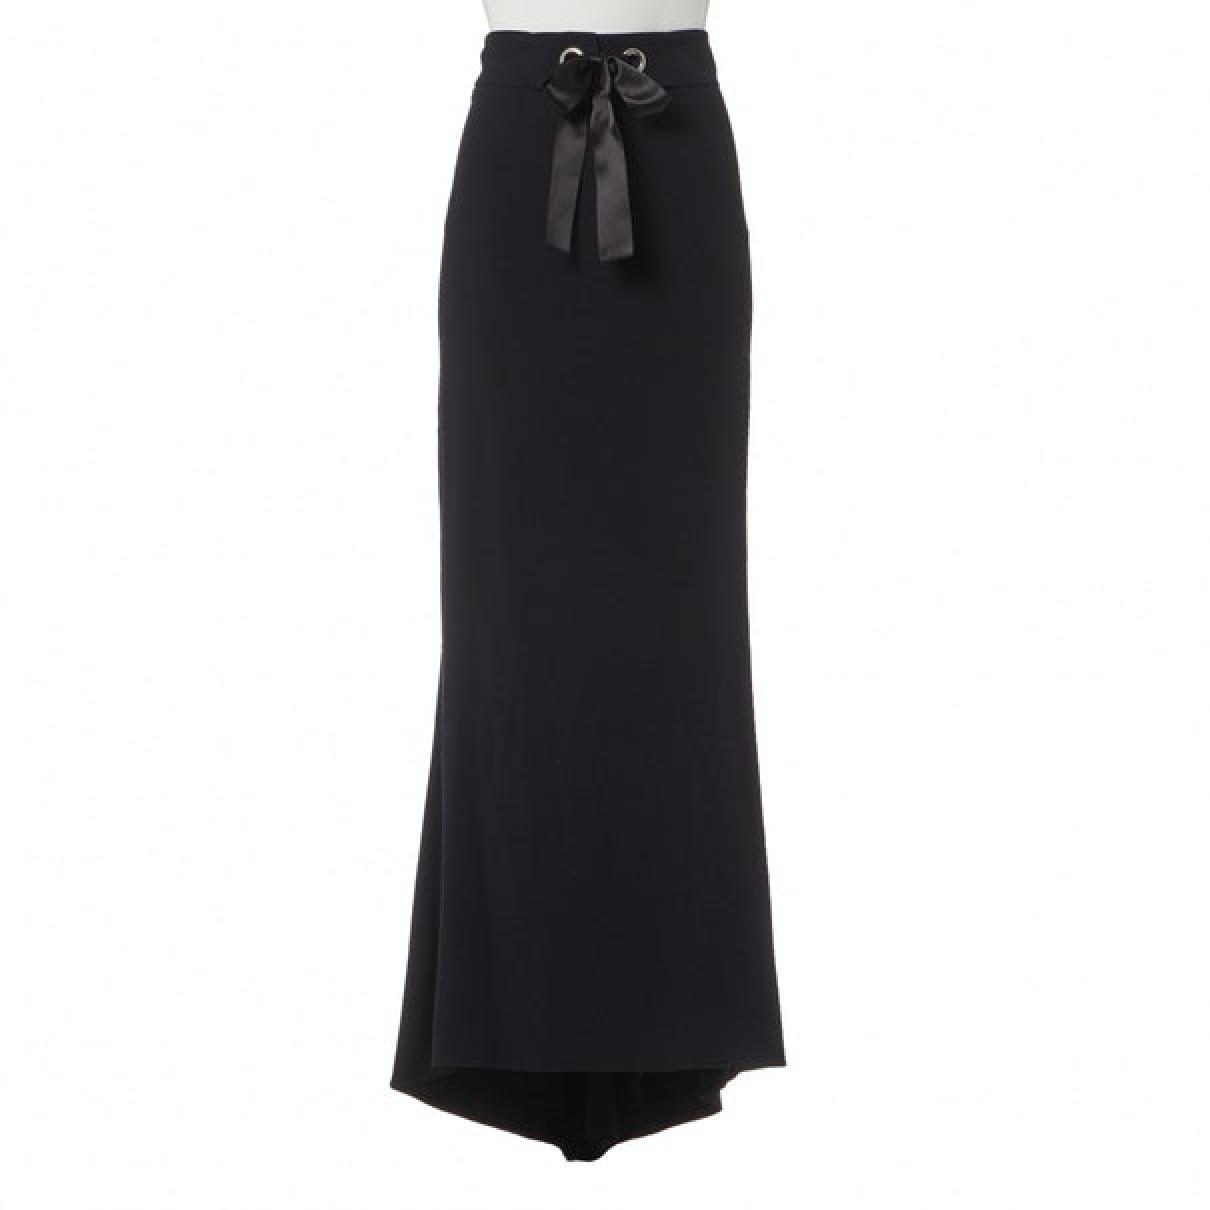 Alexander Mcqueen N Black skirt for Women 38 IT